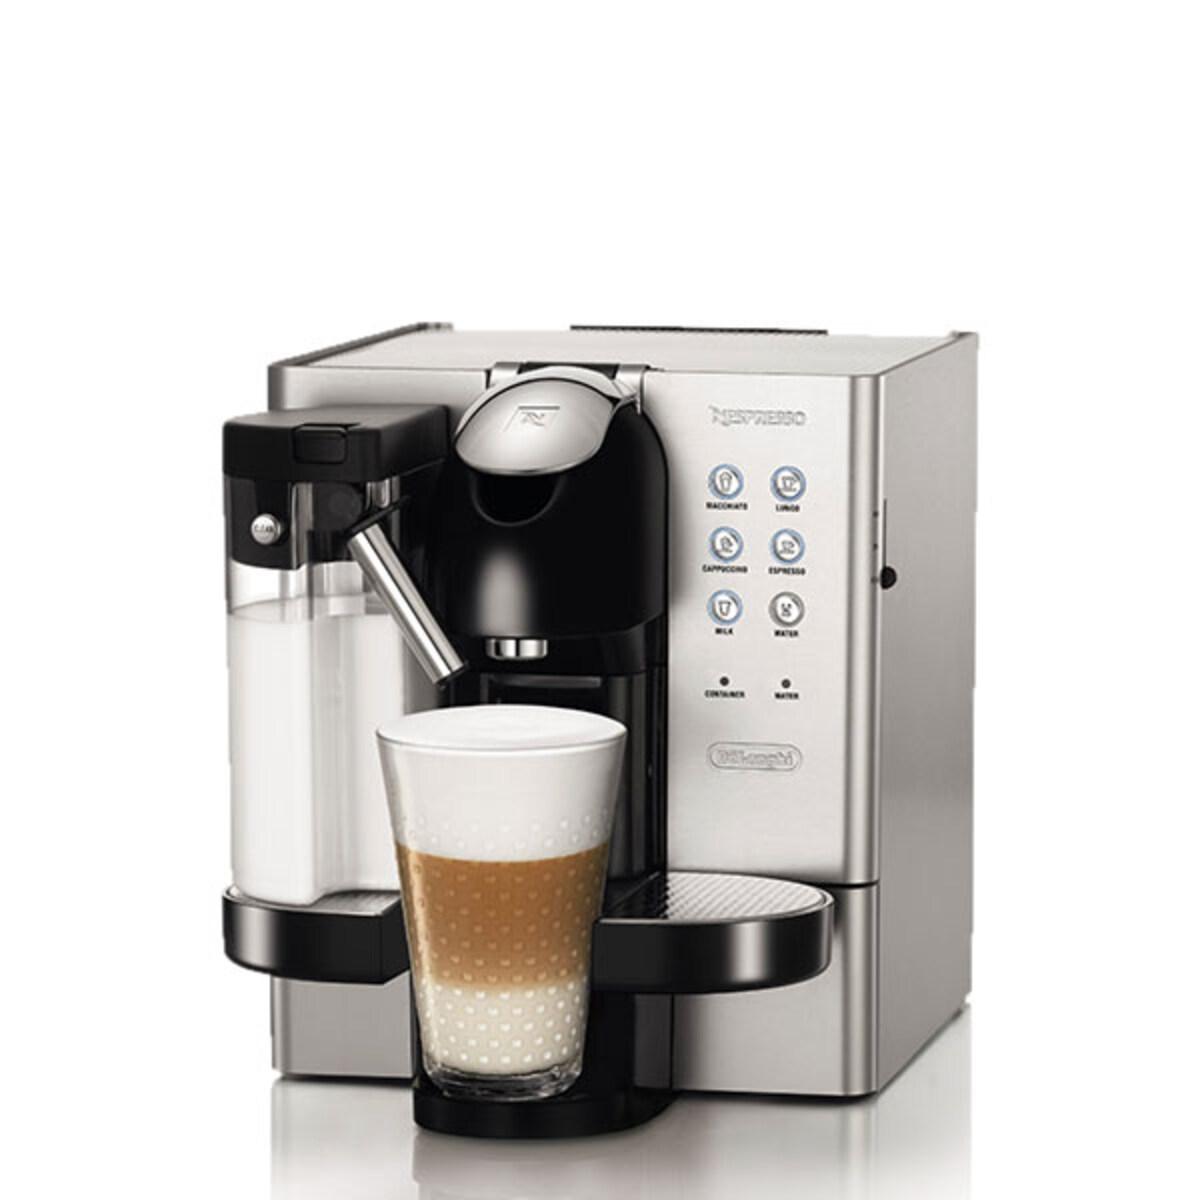 Nespresso Latissima 720 M